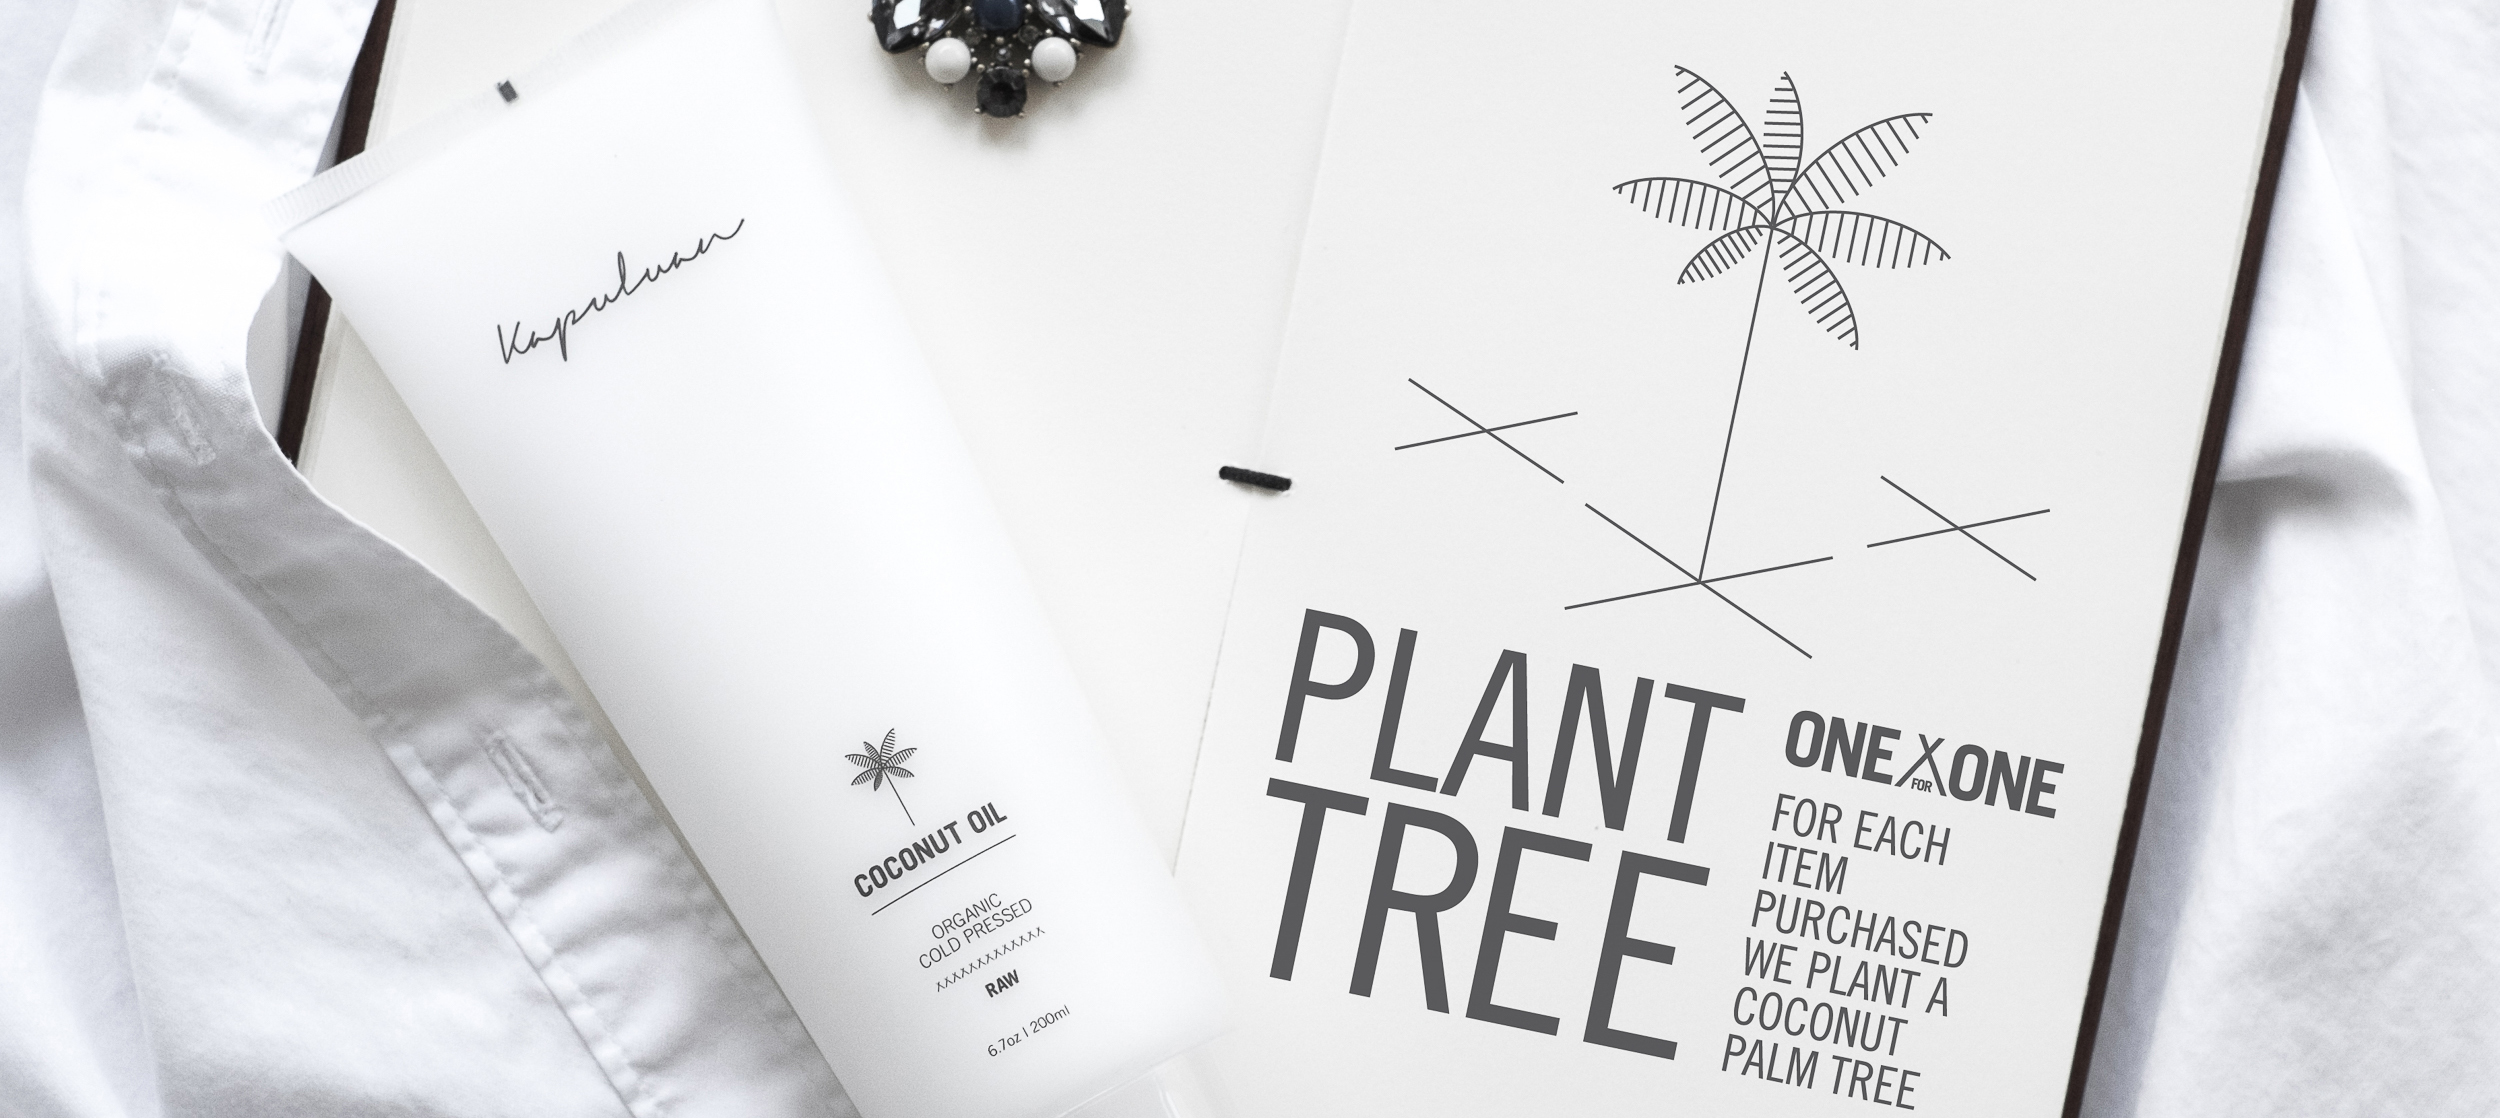 KAPULUAN TREE PLANTING copy.jpg